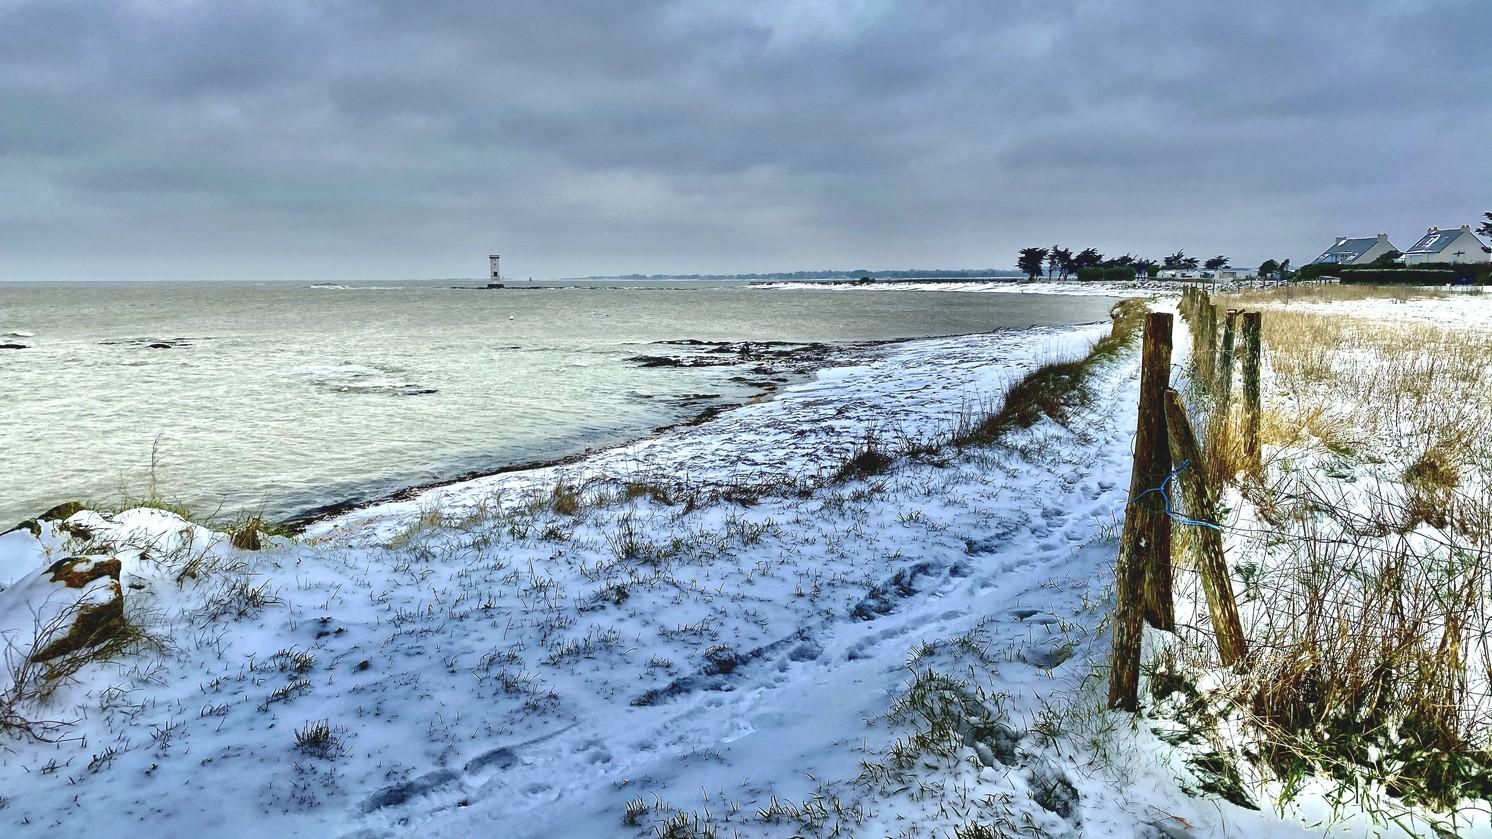 Penerf en Damgan sous la neige - morbihan bretagne©Philippe Jaquemin (3)